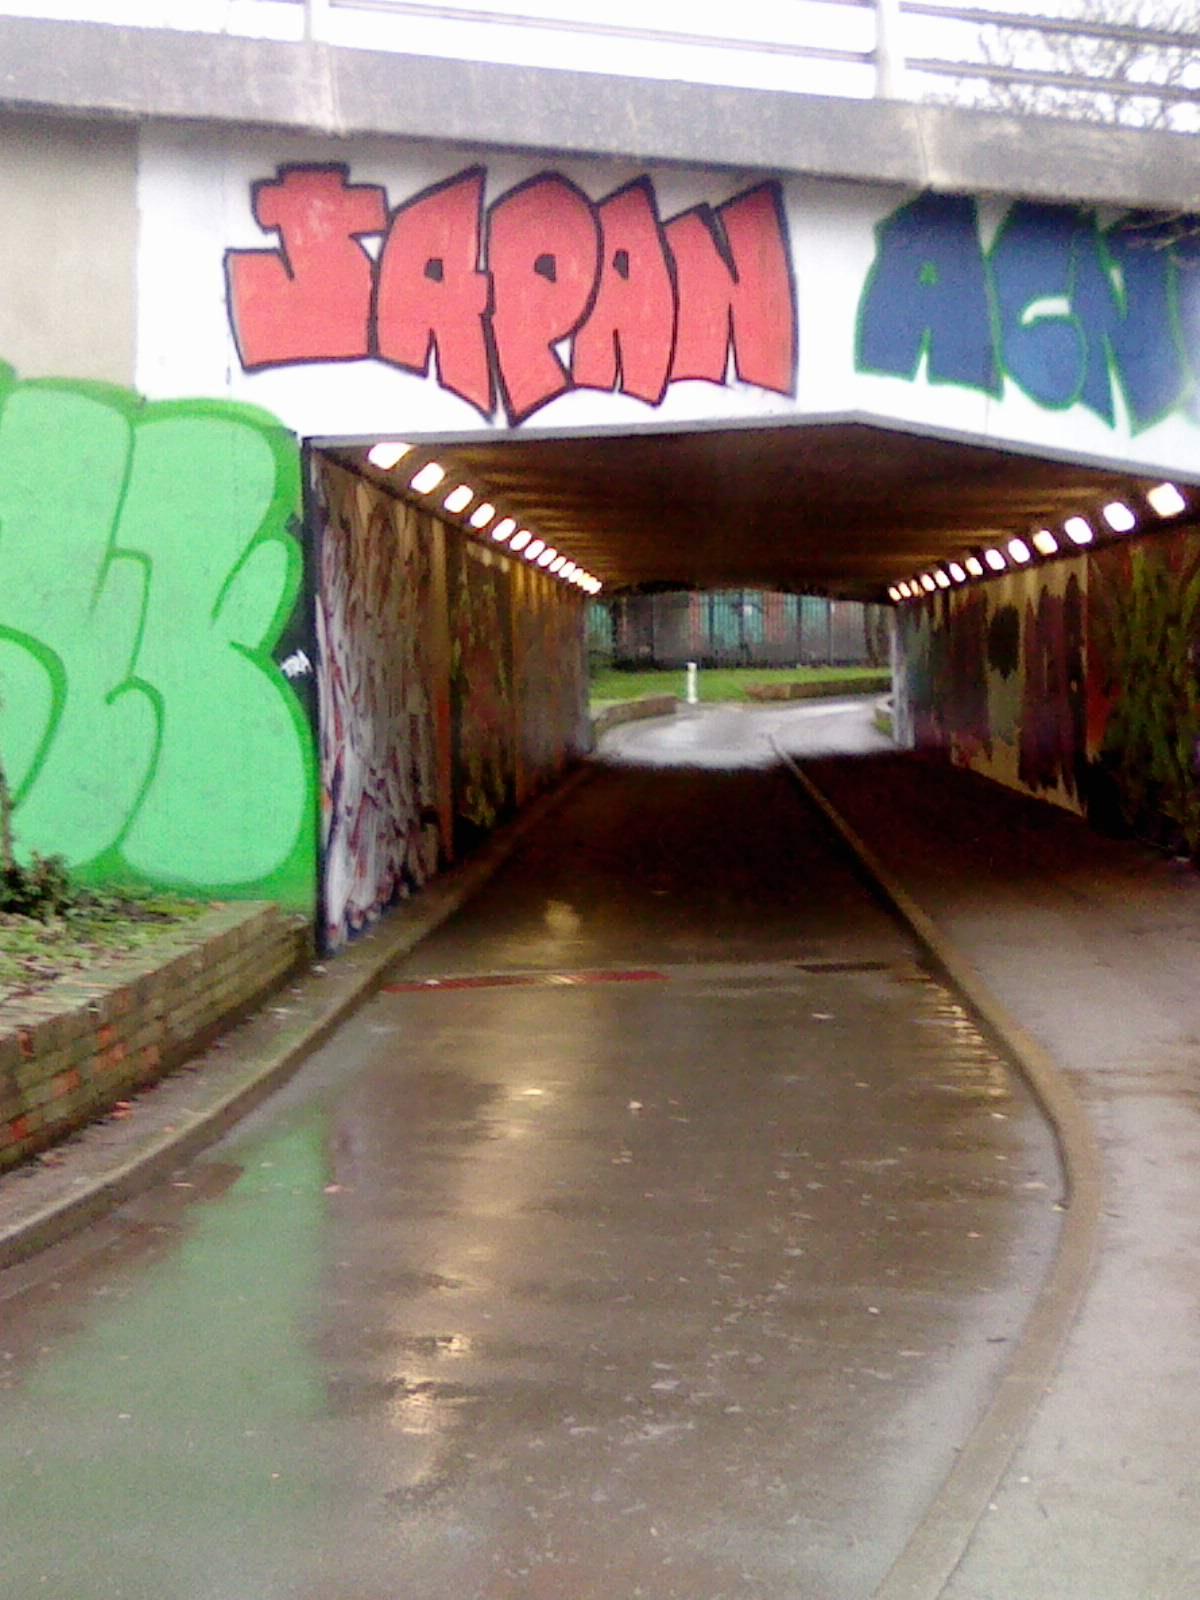 Hotspot: subway-leycroft-rd